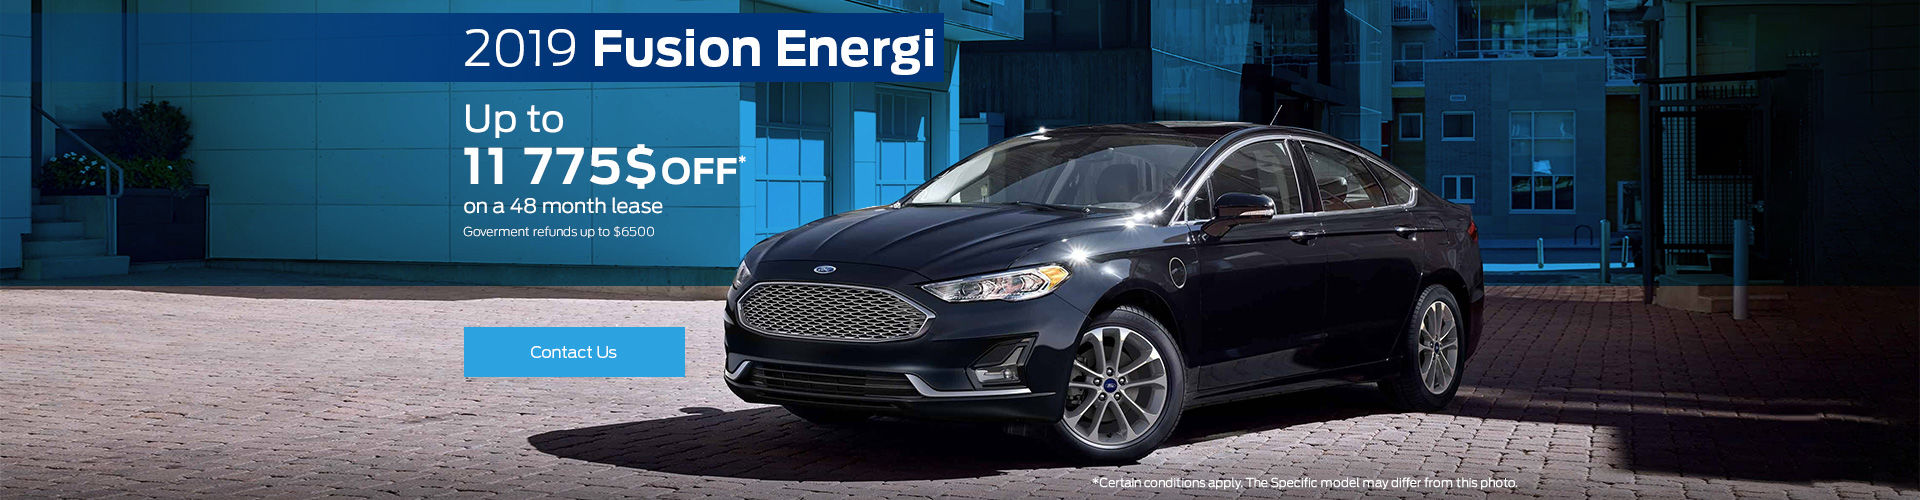 2019 Fusion Energi